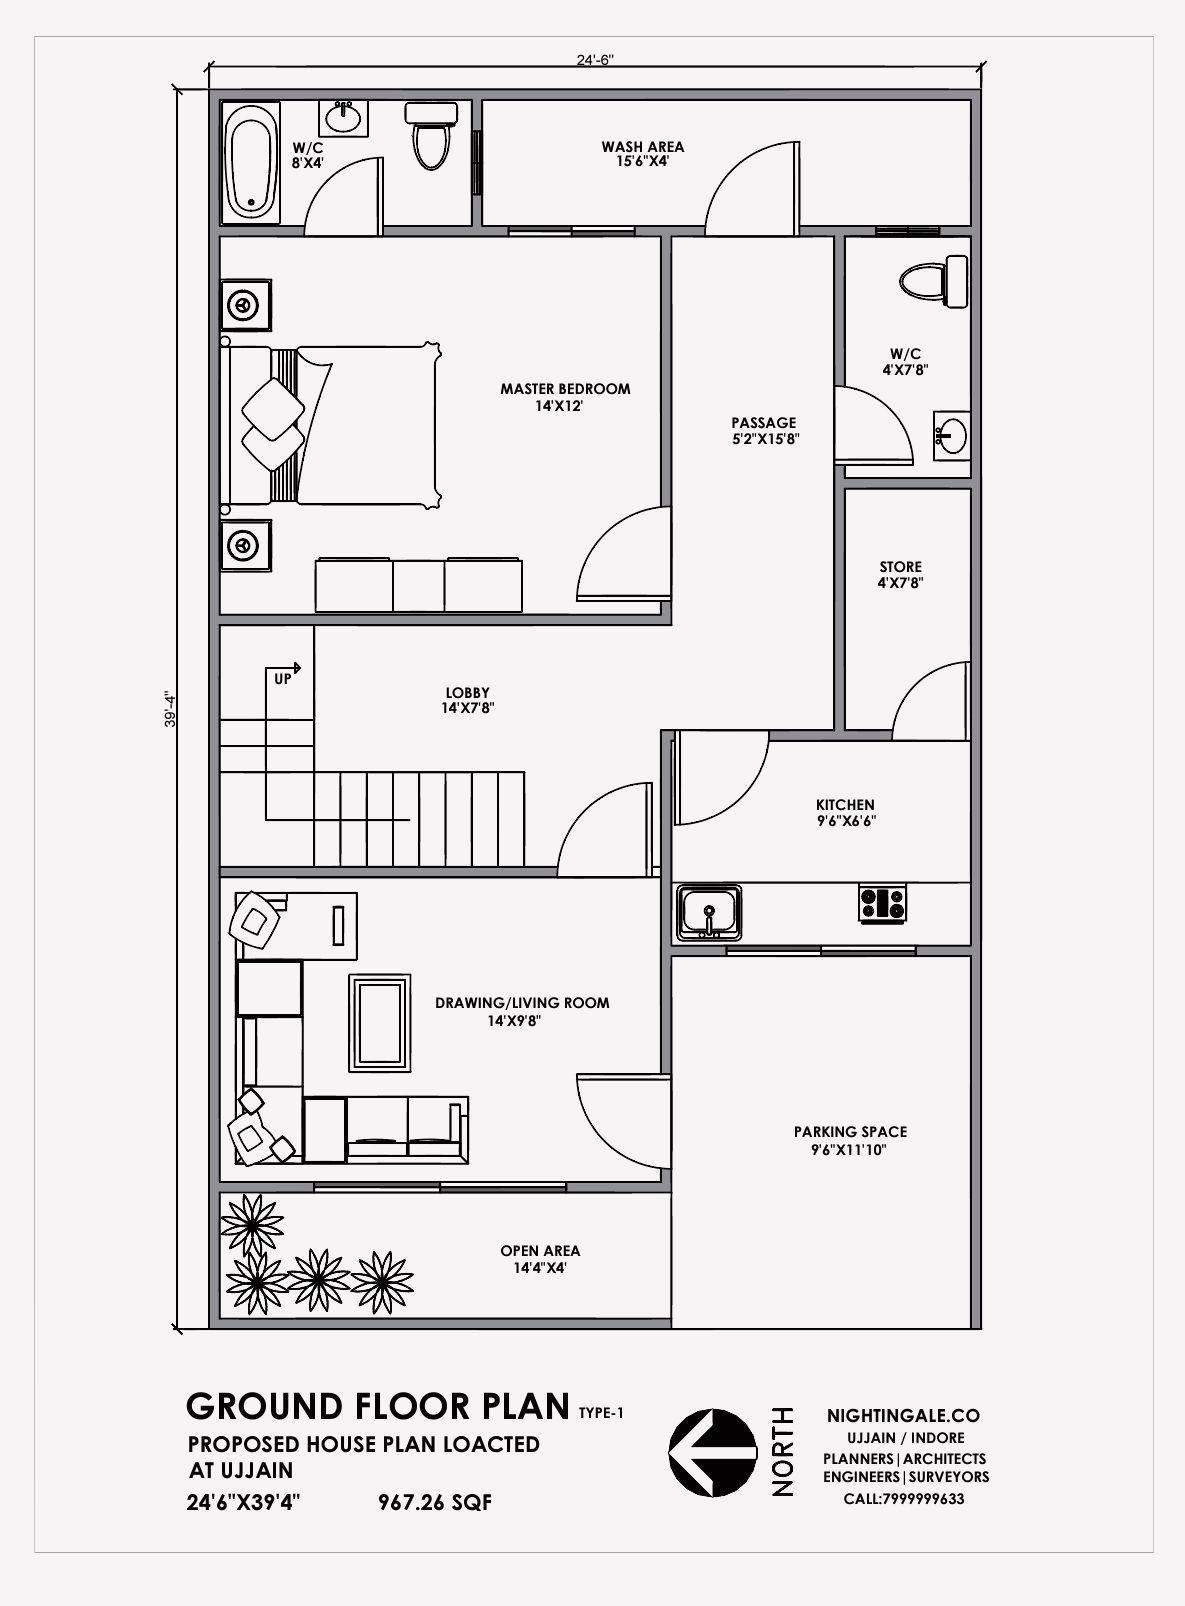 15 House Design Ground Floor Plan In 2020 20x30 House Plans Indian House Plans 20x40 House Plans